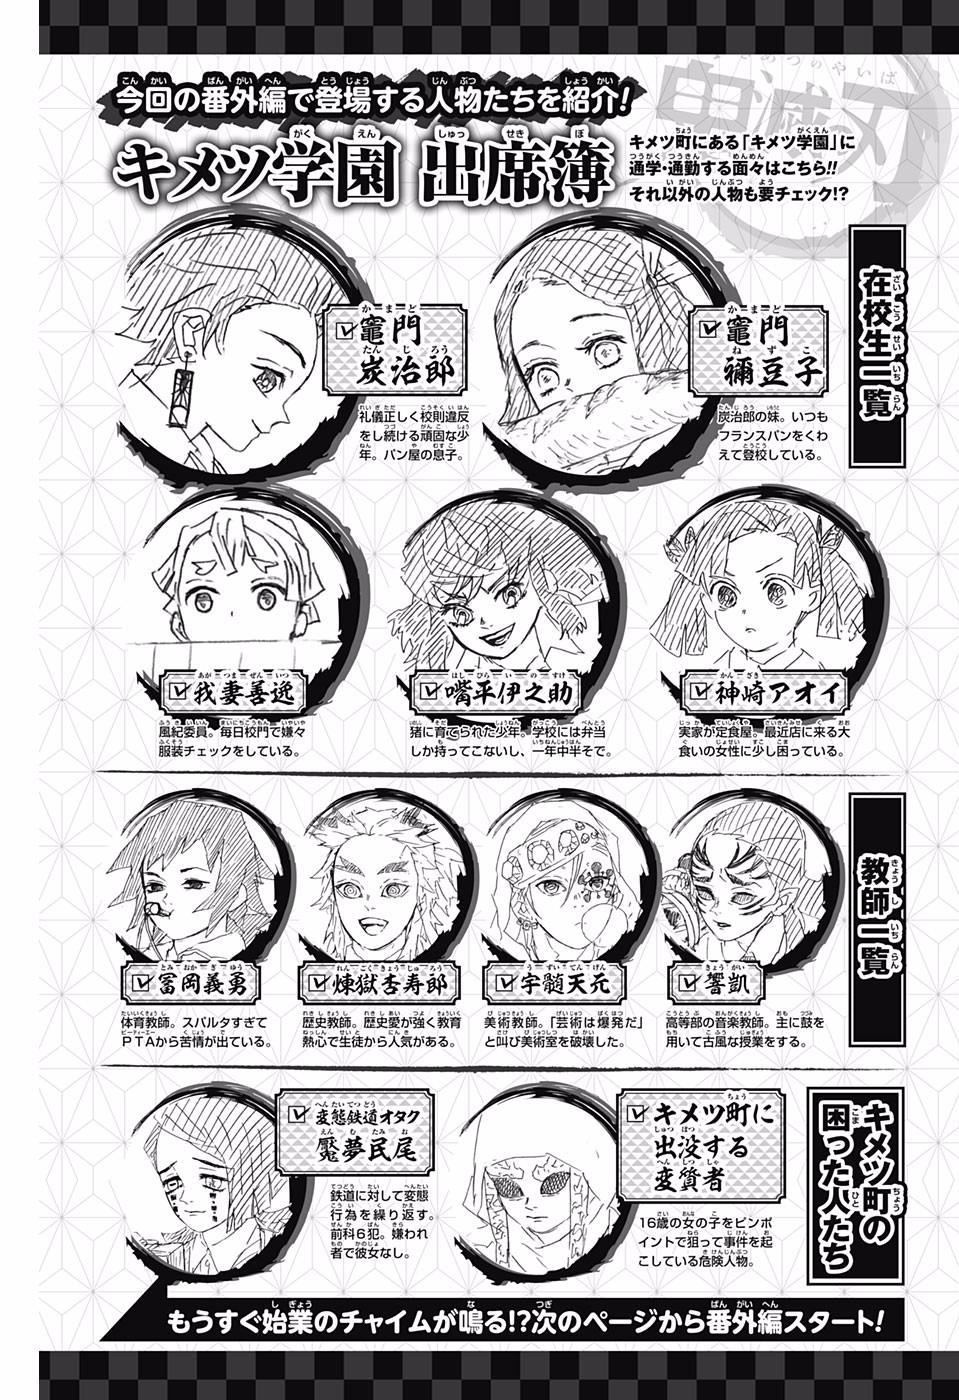 Kimetsu no Yaiba Chapter 95.5  Online Free Manga Read Image 2